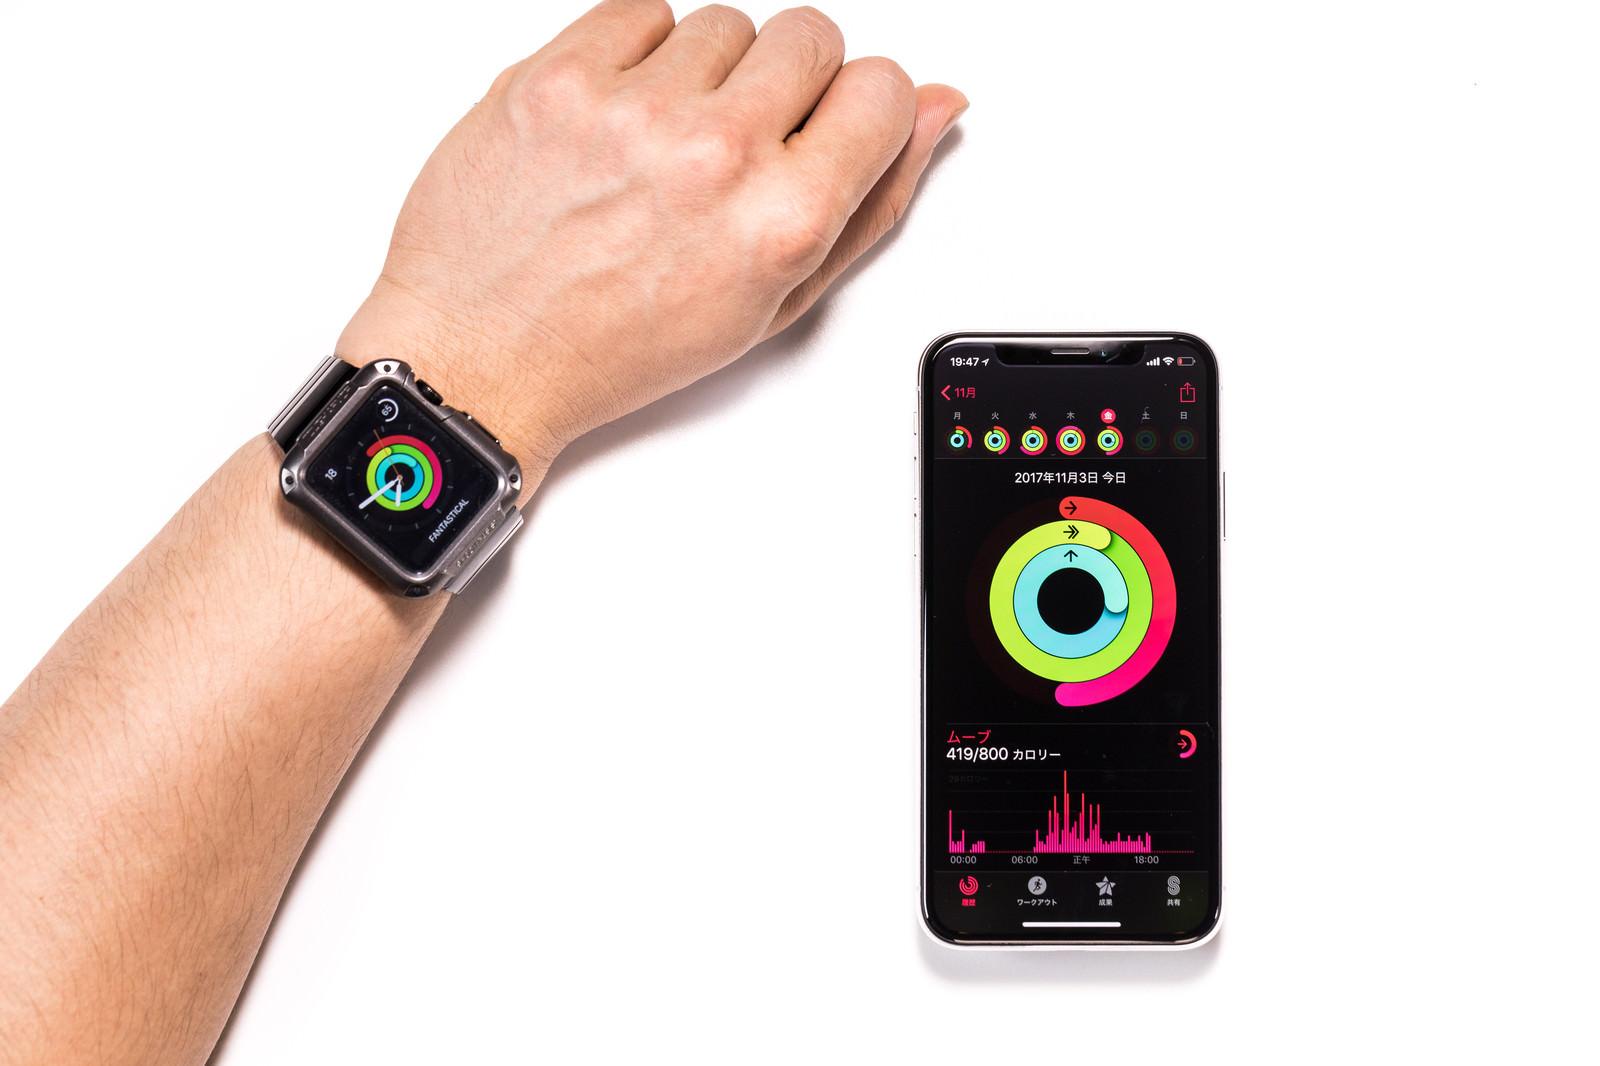 iPhonexIMGL6700_TP_V-Apple-watch-activitiy.jpg